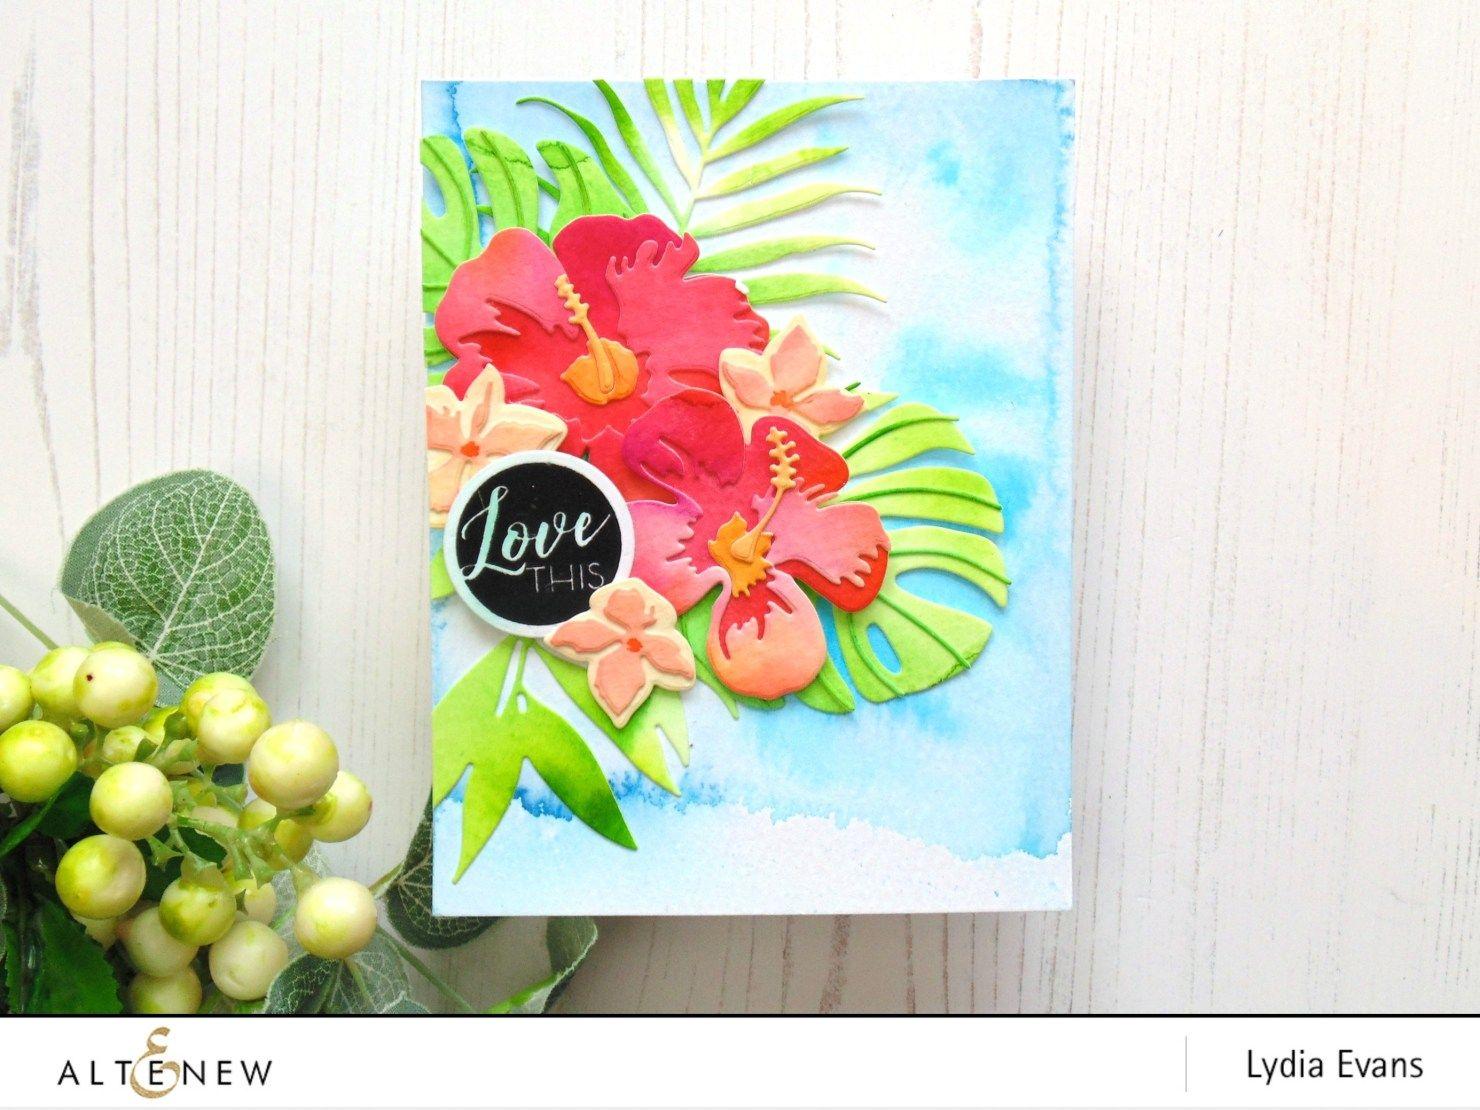 Lydia Evans Altenew Watercolor Brush Markers Release Blog Hop